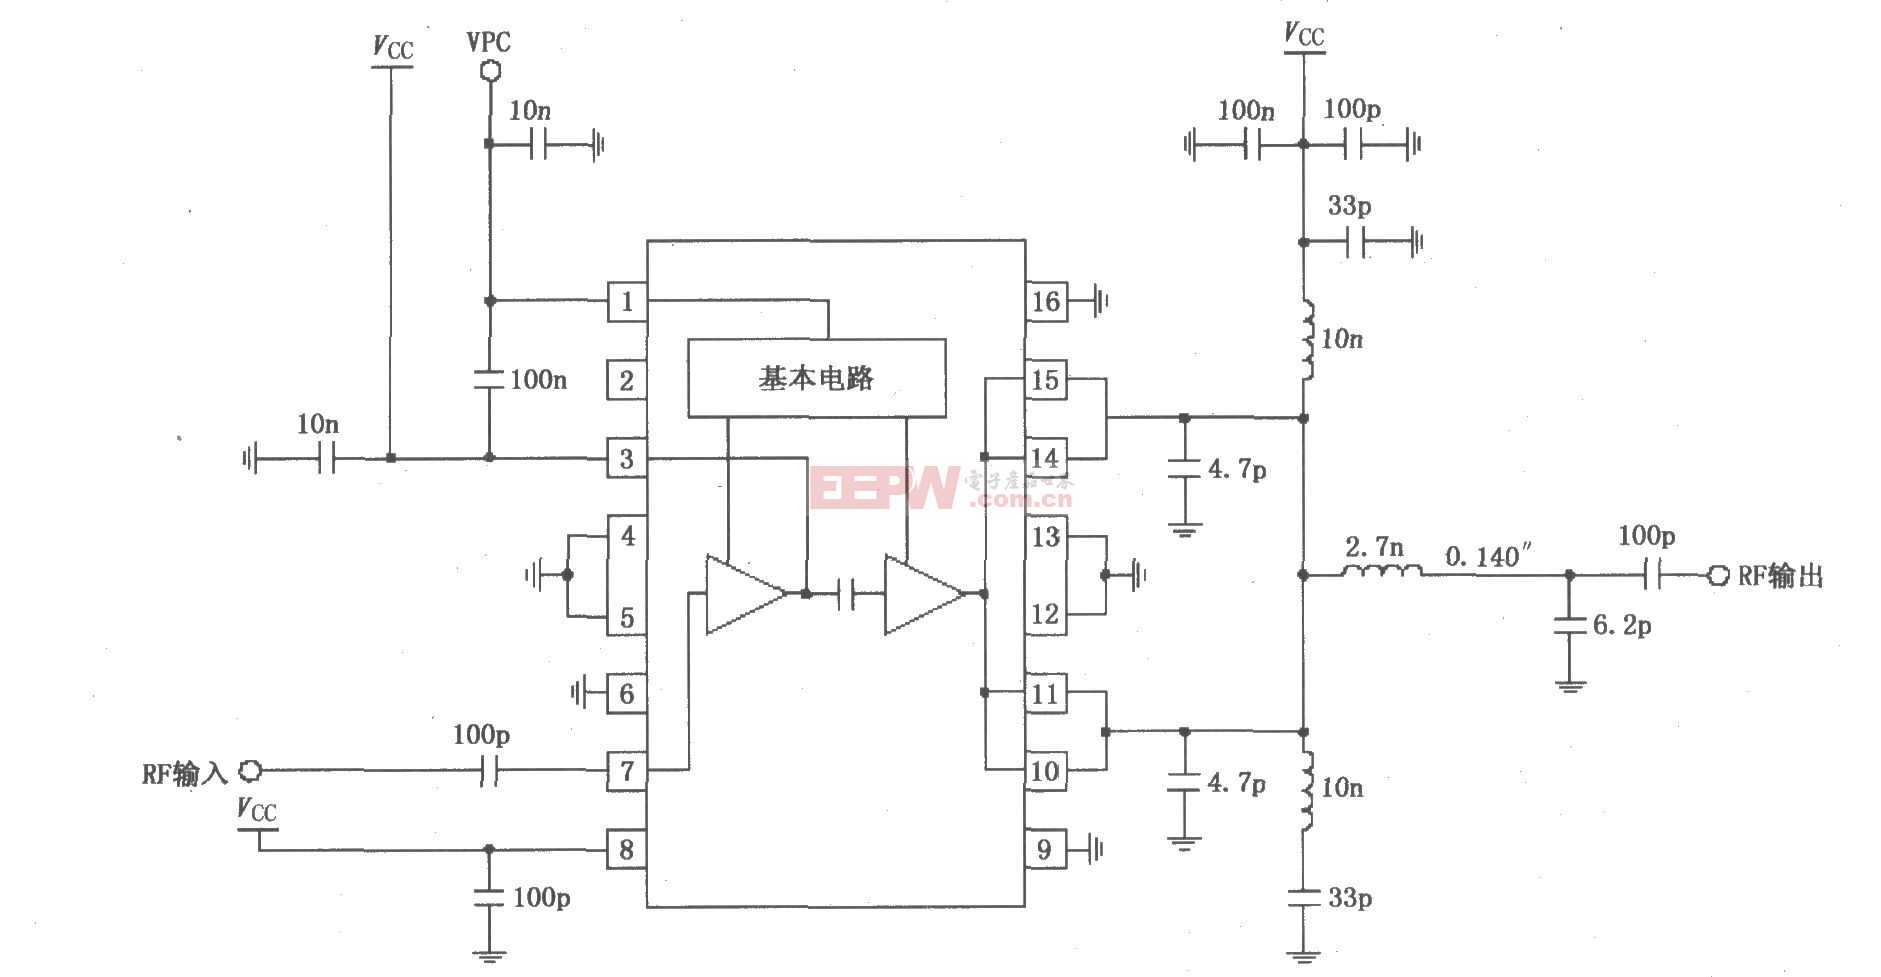 RF2131在4.0~4.8V电源供电时获得最佳功率和效率放大器电路图